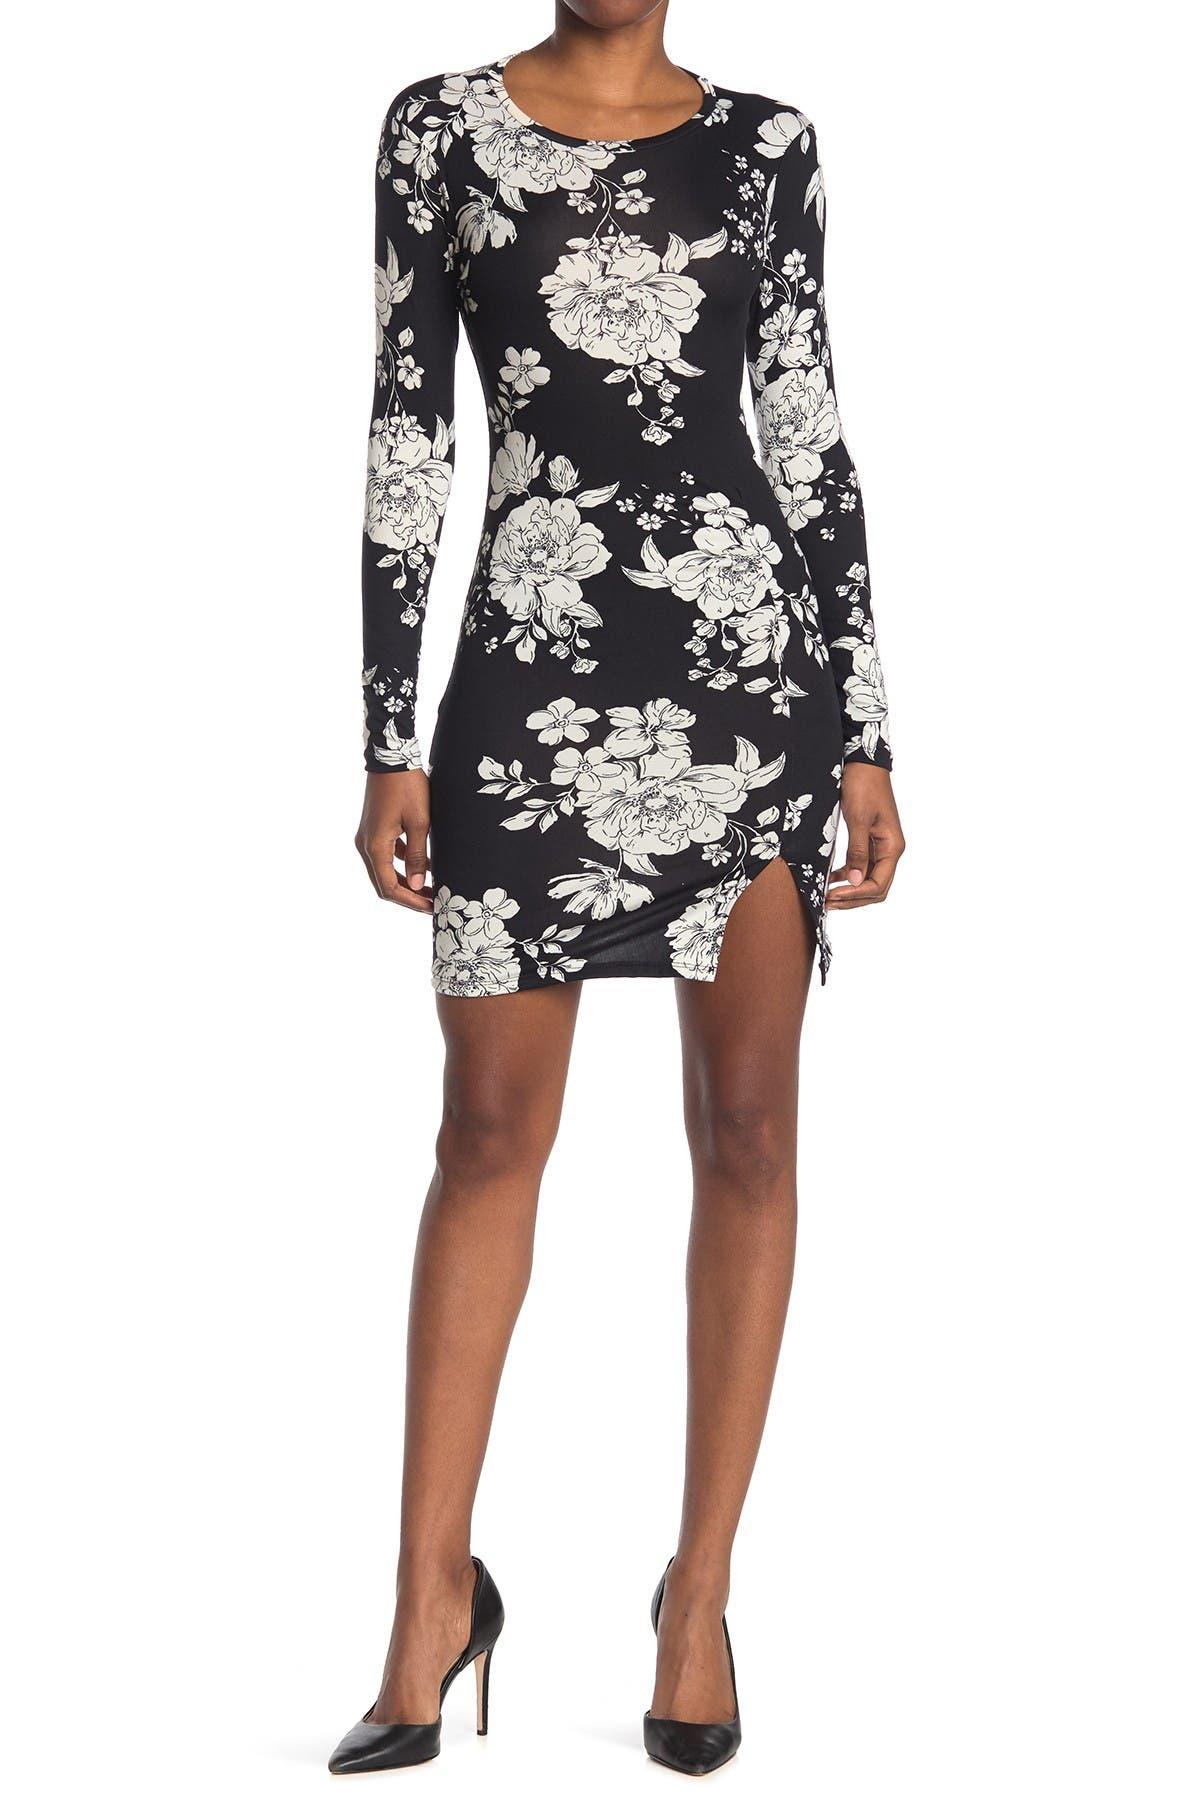 Image of Velvet Torch Ruche Print Vent Mini Dress